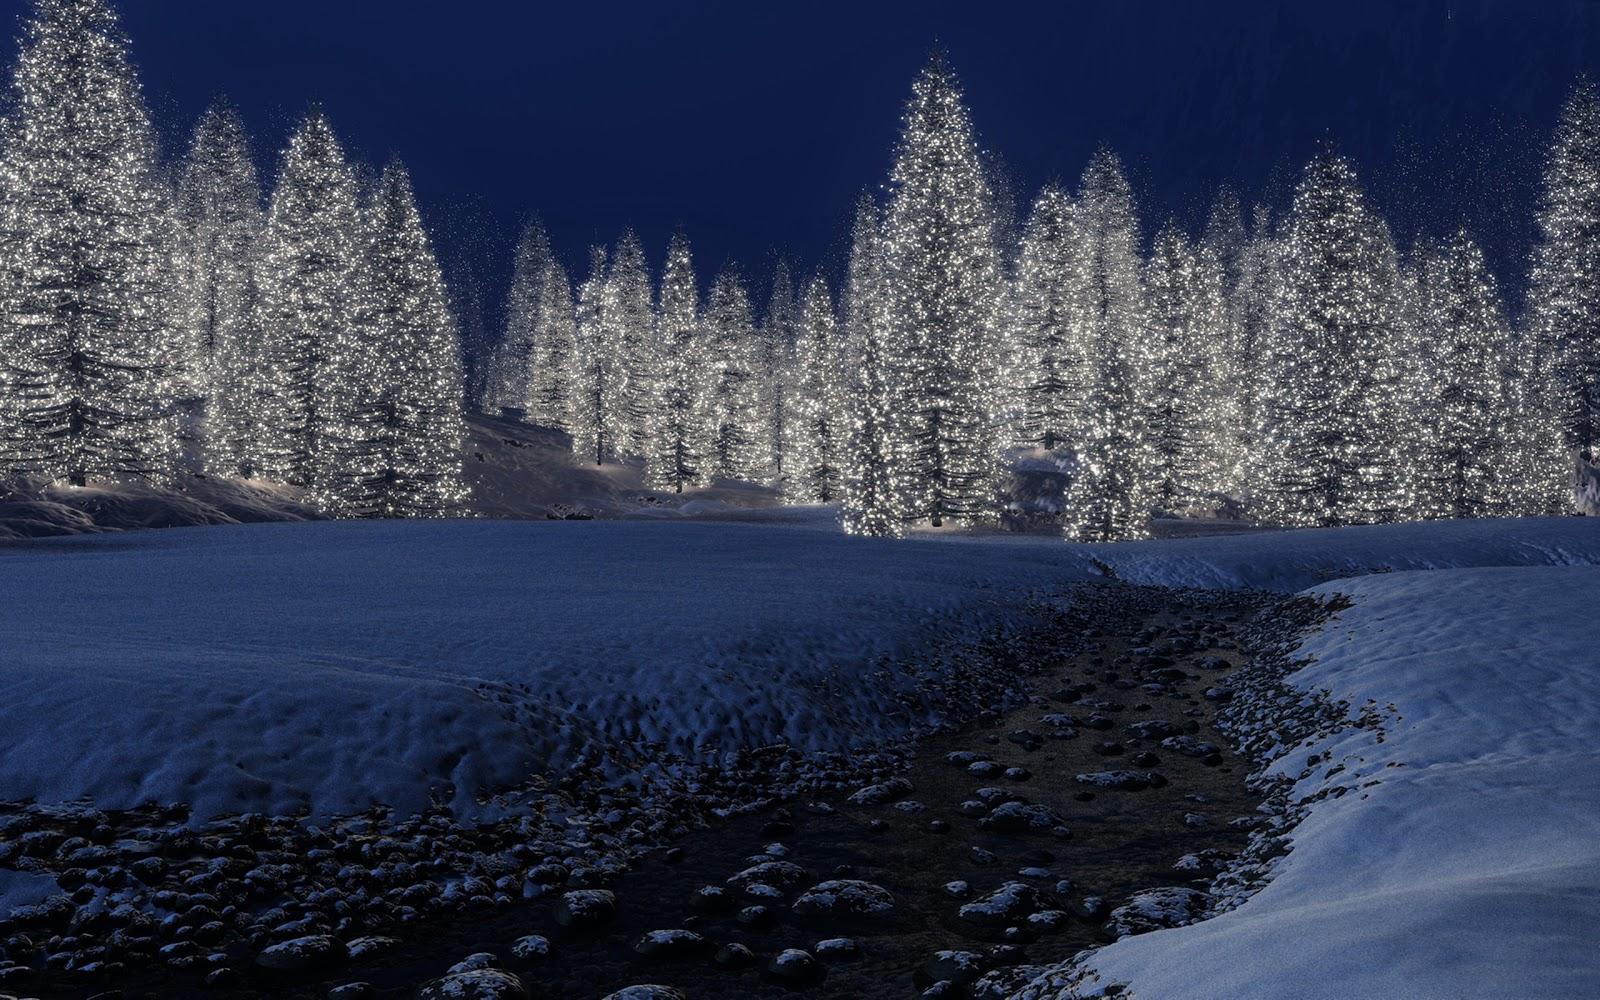 Weihnachtsbilder Hd.Everyhour Hd Wallpaper